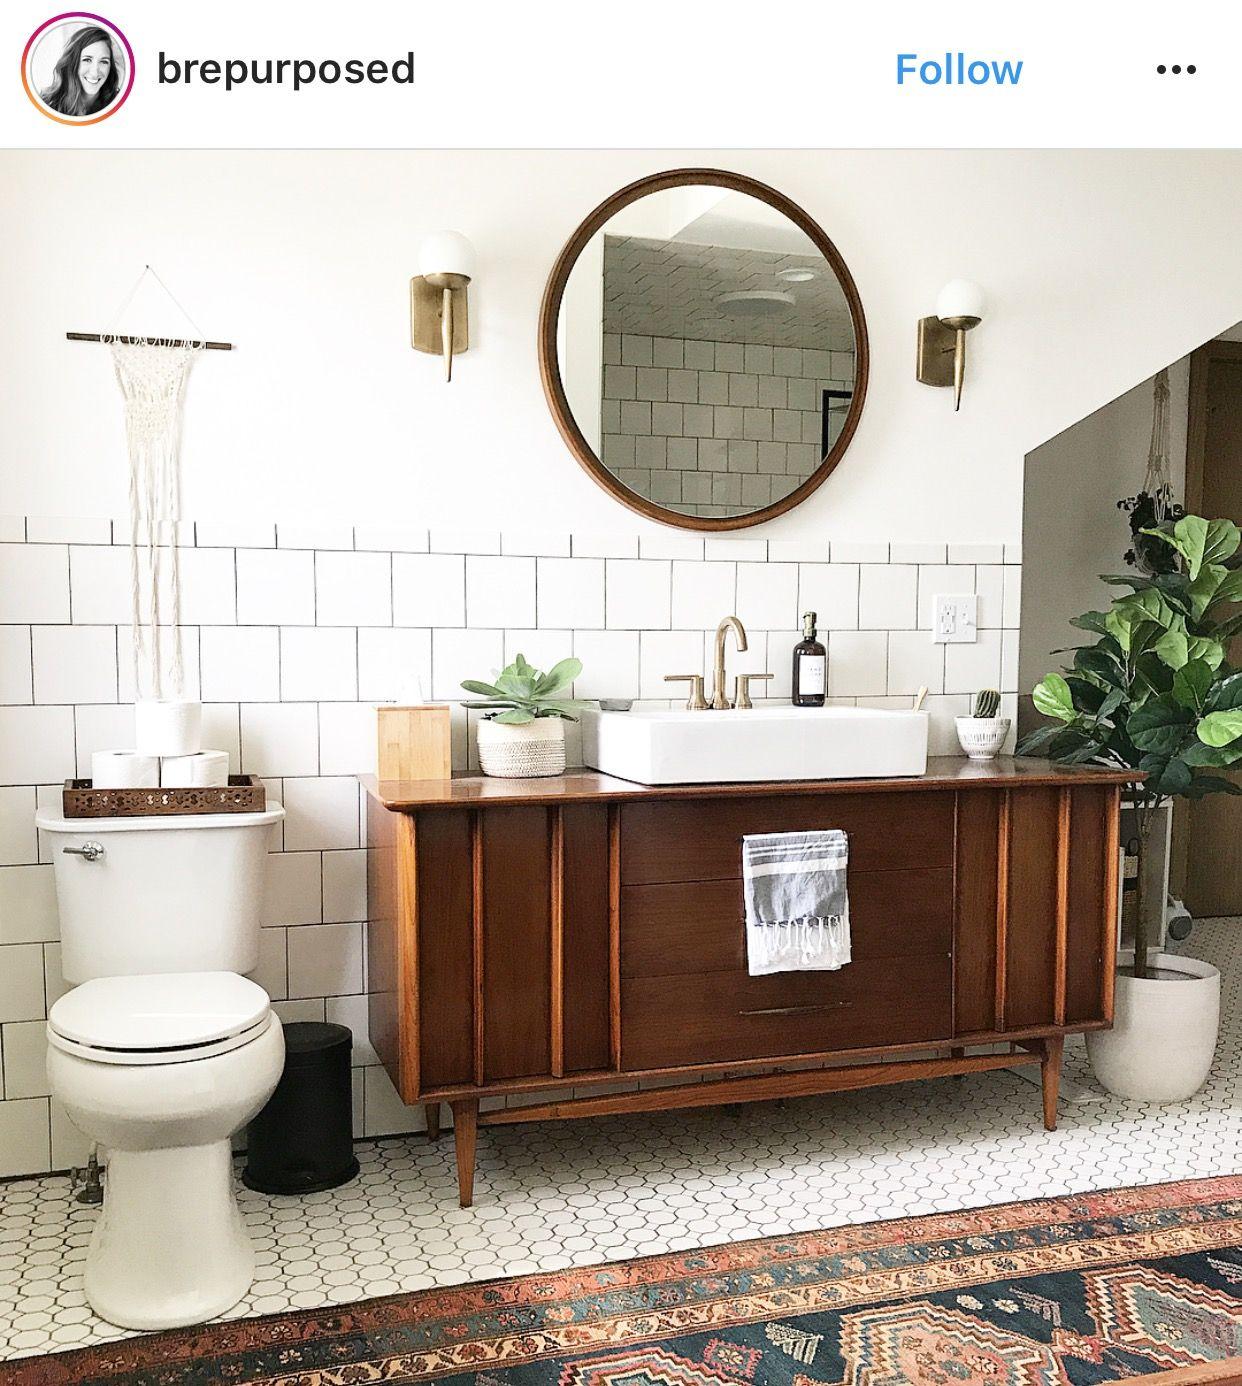 Pin by rebecca bateman on living ideas pinterest bath and interiors